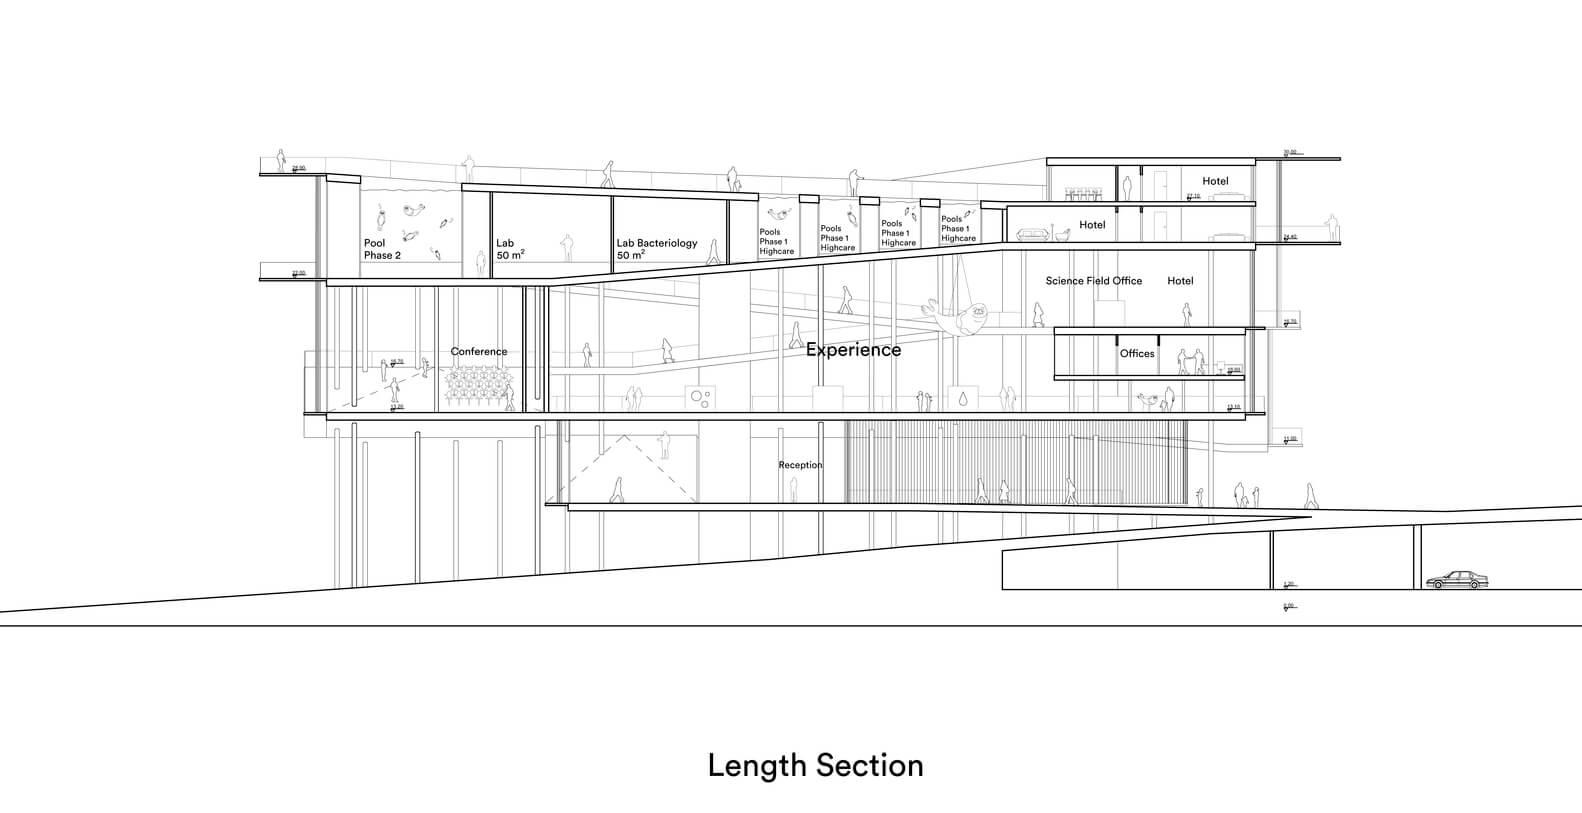 Desain Kantor Situs Warisan Dunia UNESCO di Laut Wadden - Length_Section - ArchDaily - BeliSewaRumah